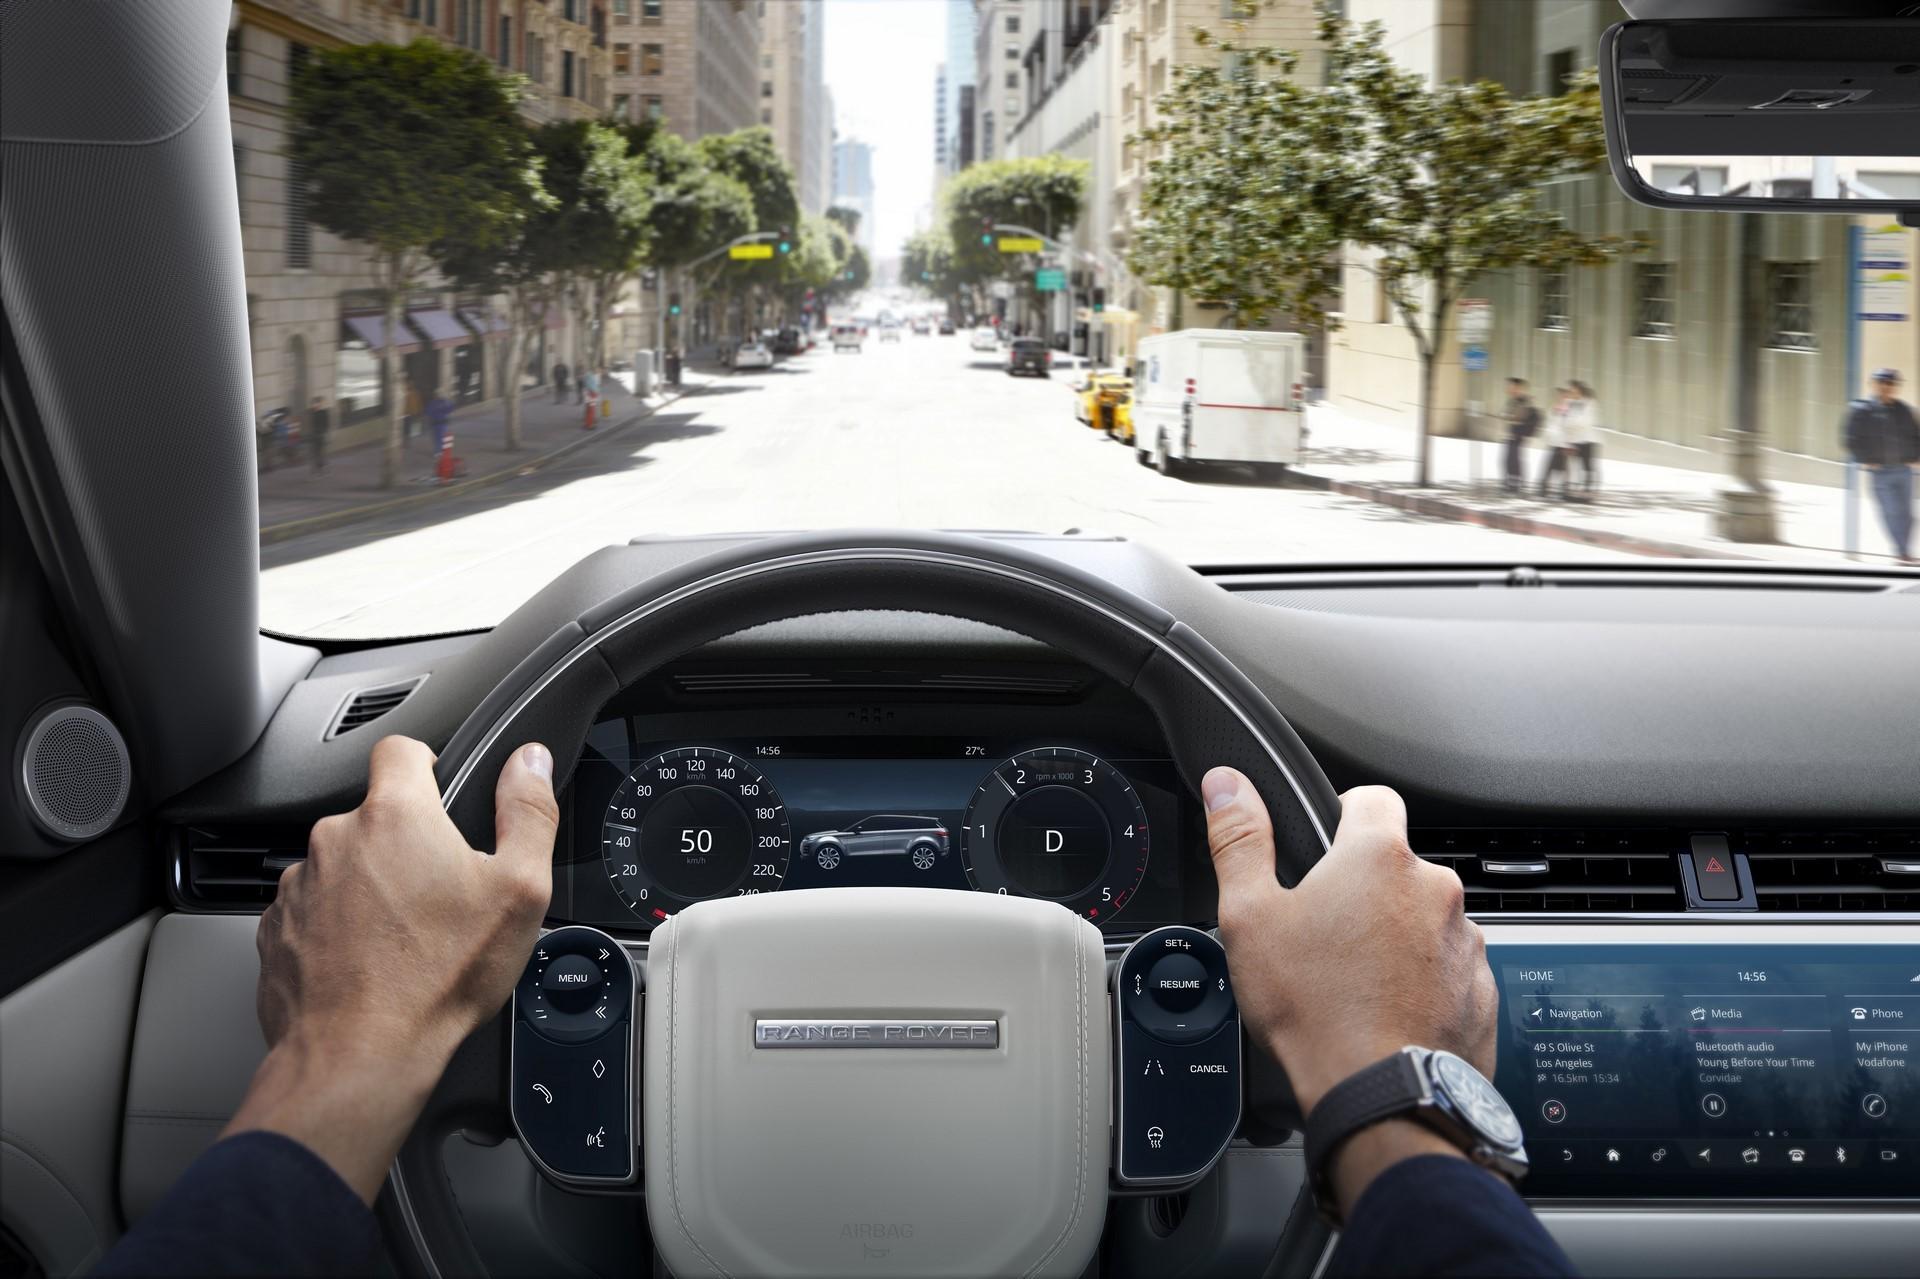 Range Rover Evoque 2019 (51)